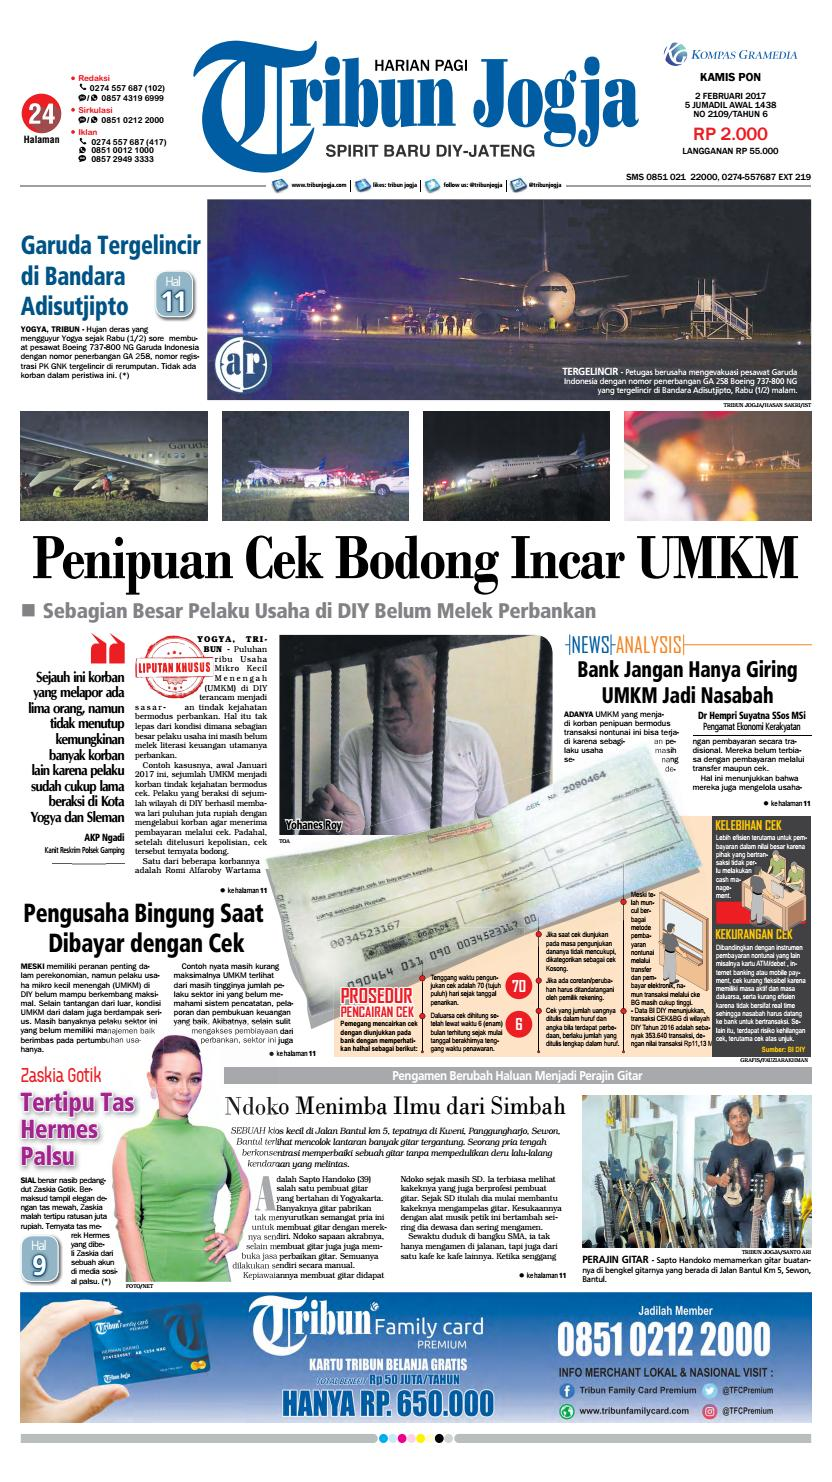 Tribunjogja 01 12 2015 By Tribun Jogja Issuu Produk Ukm Bumn Batik Tulis Babon Angrem 02 2017